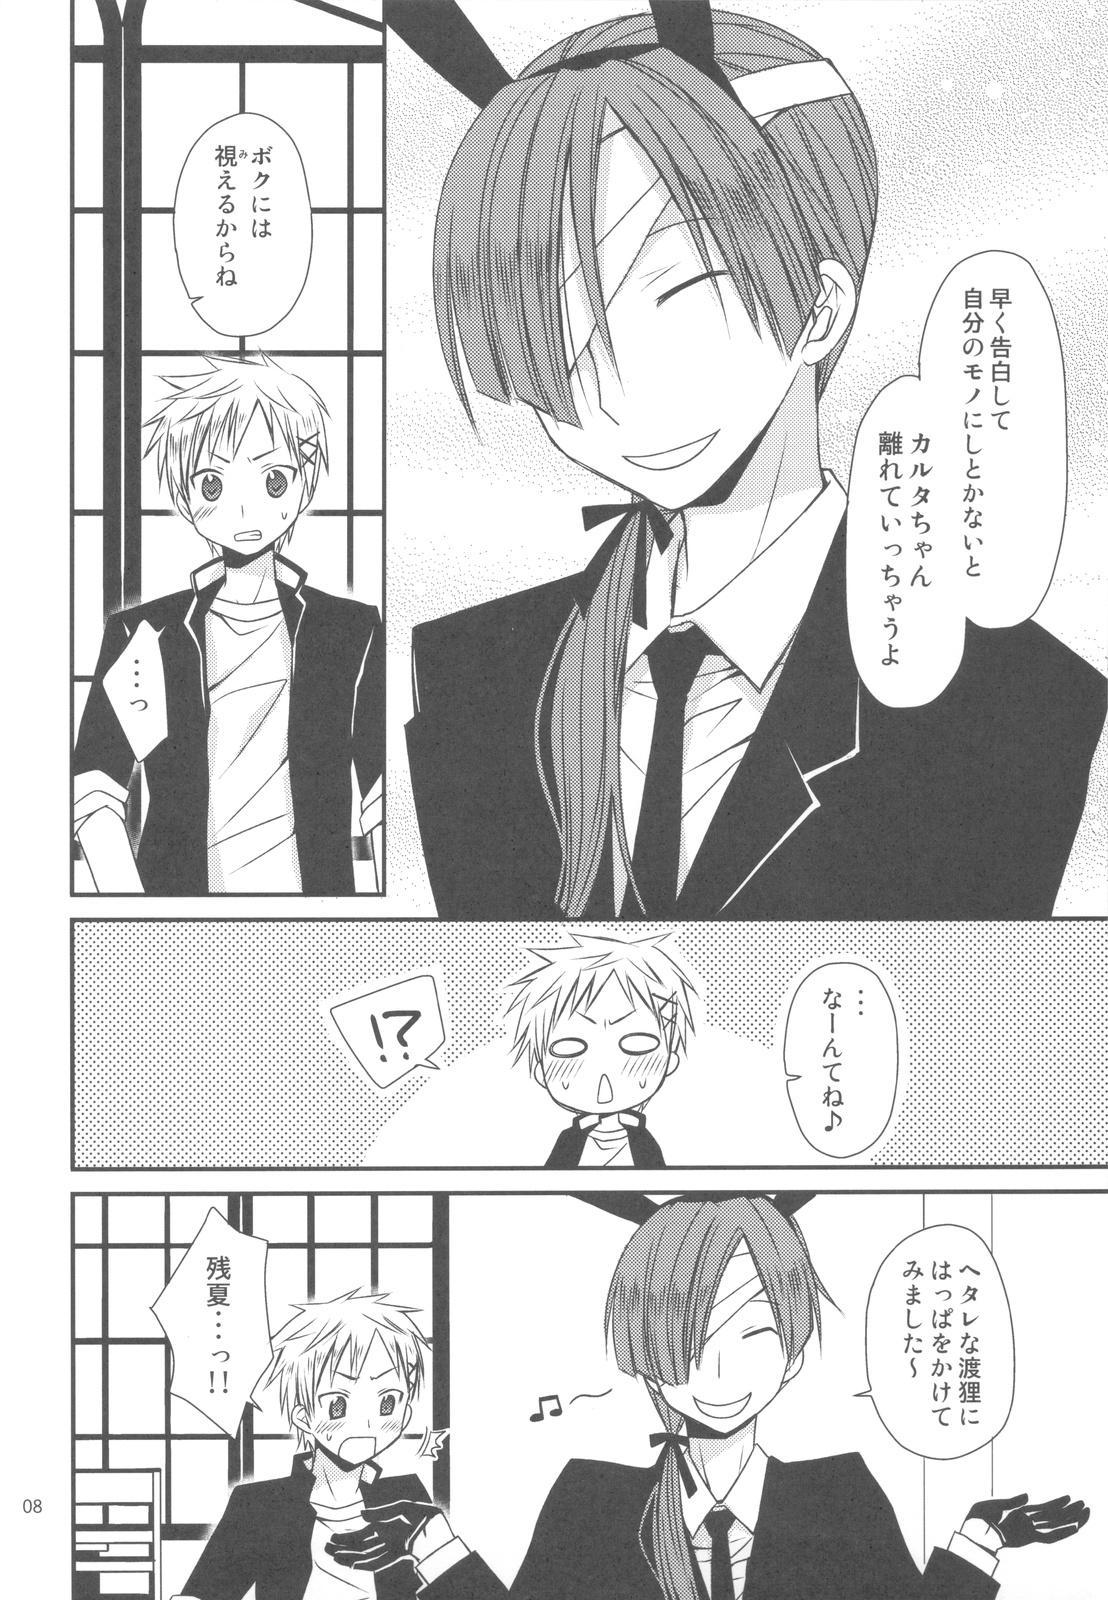 Chiisana Ai no Monogatari 6